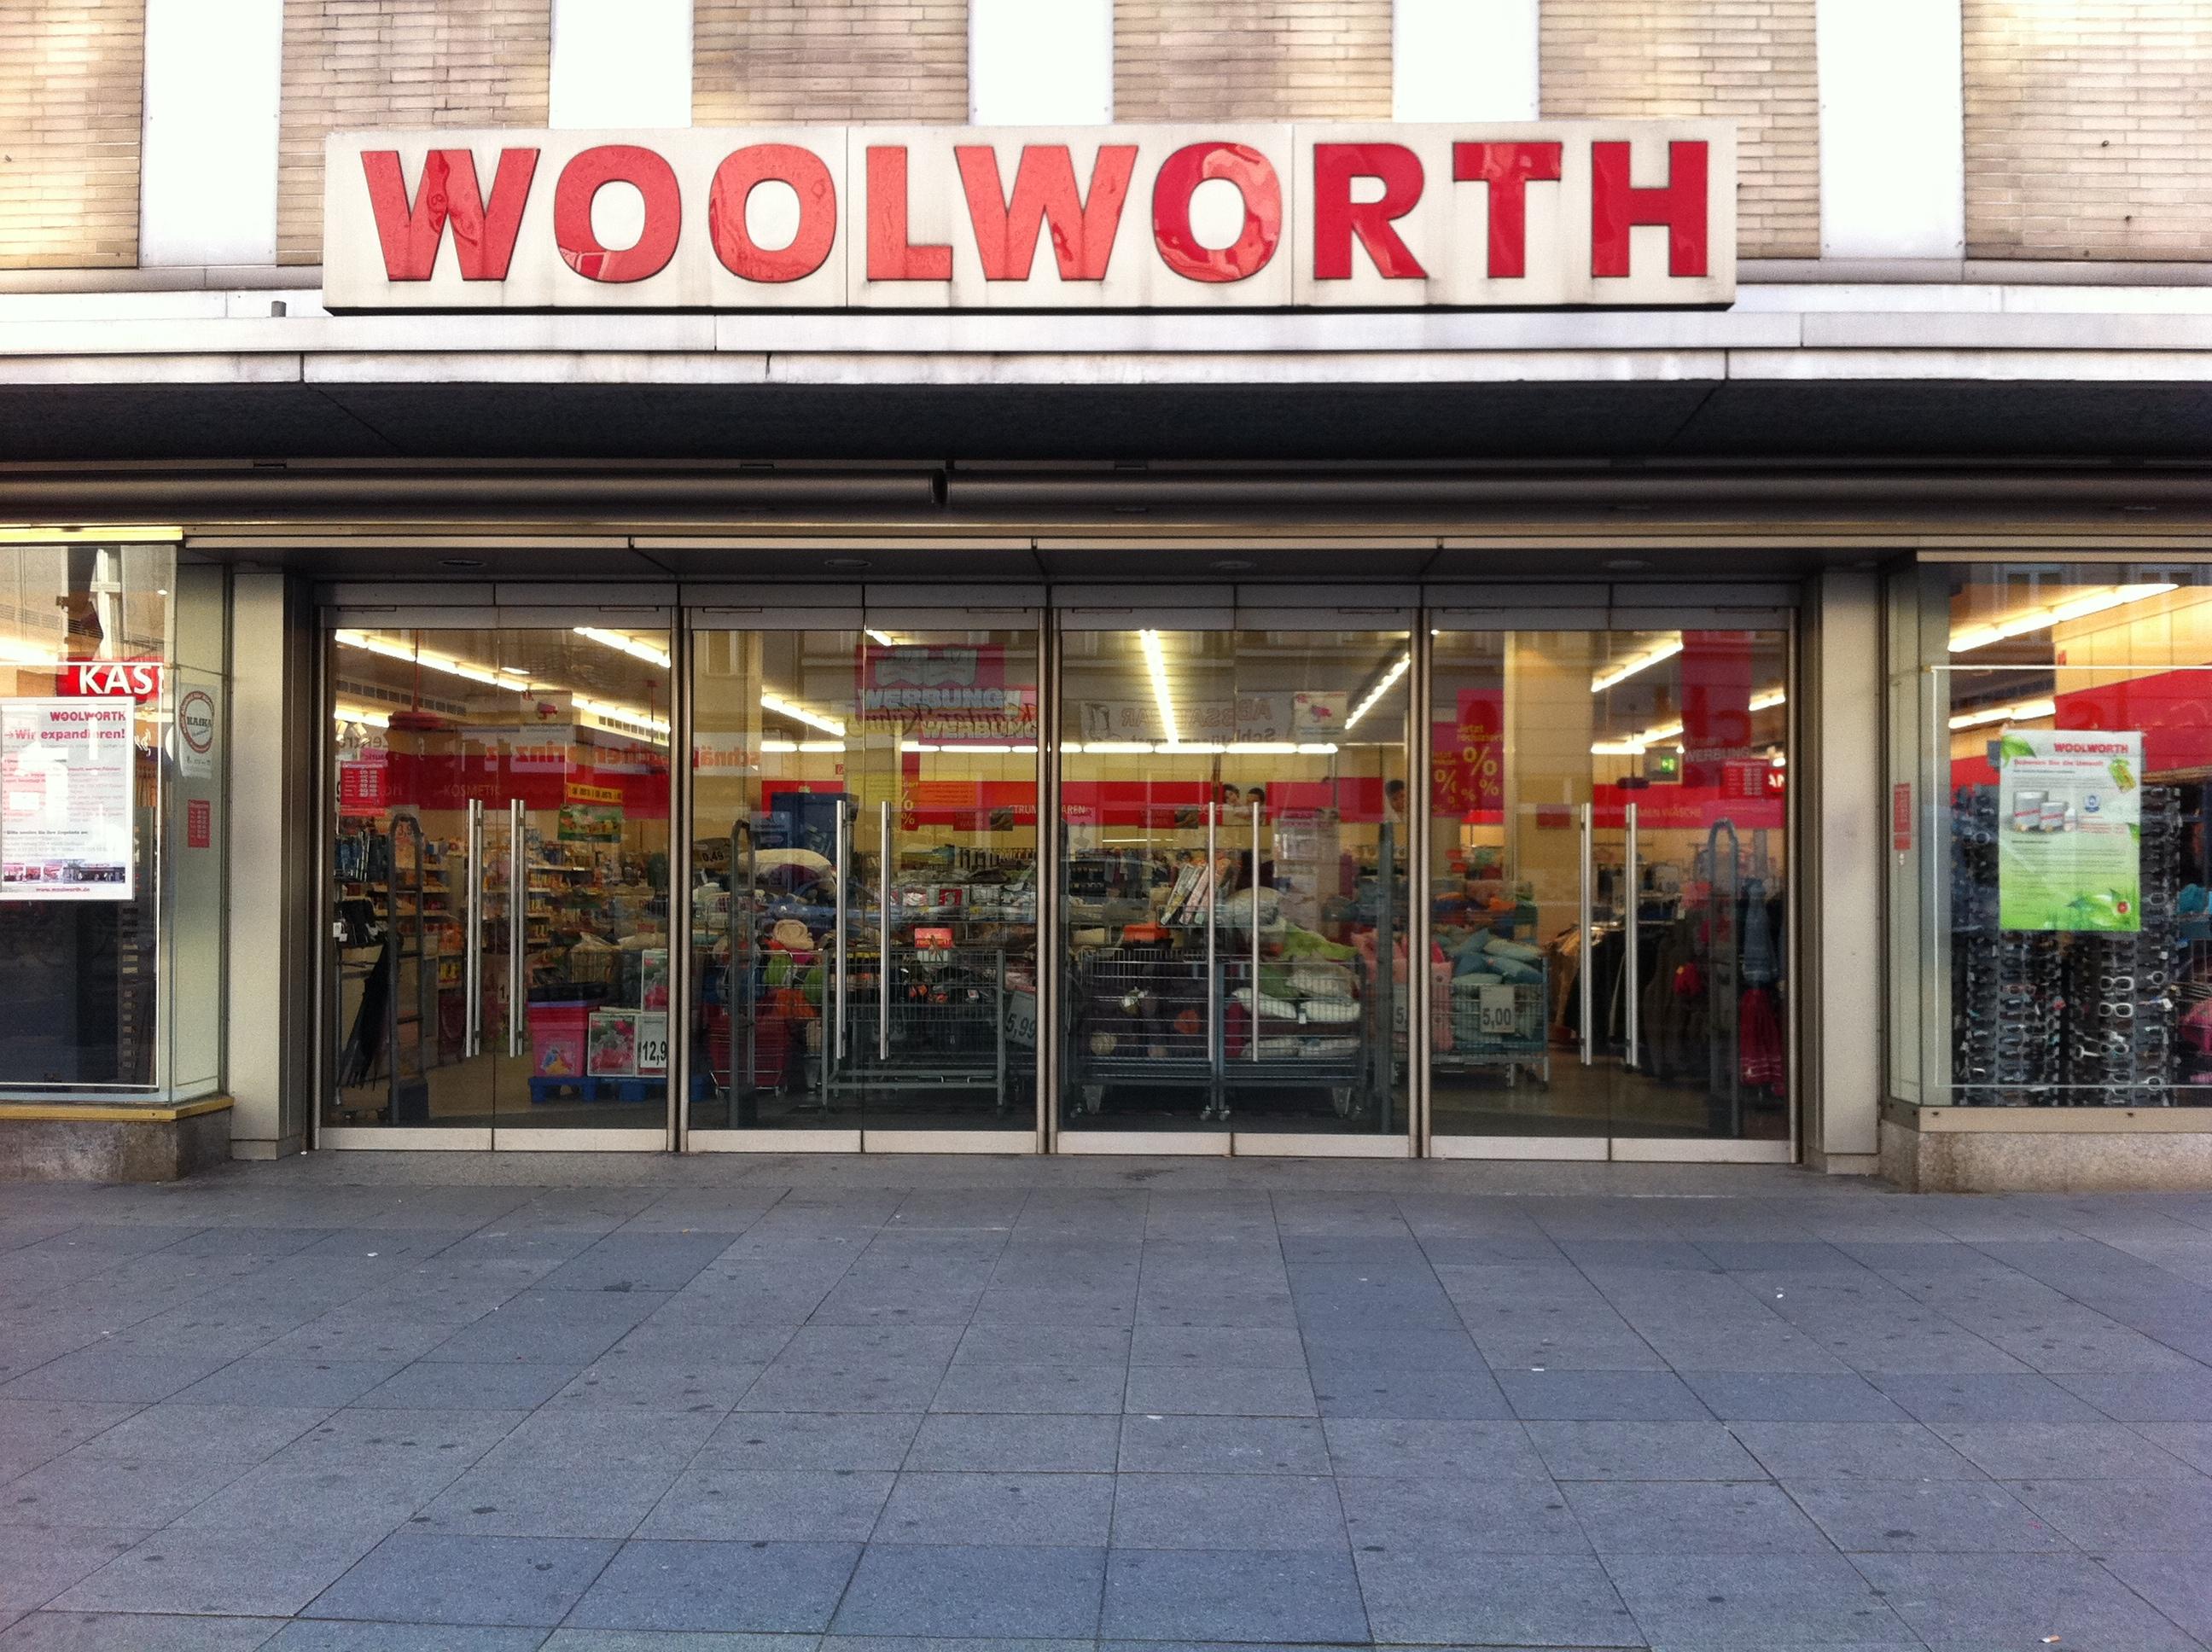 woolworth - 1 foto - berlin neukölln - karl-marx-straße